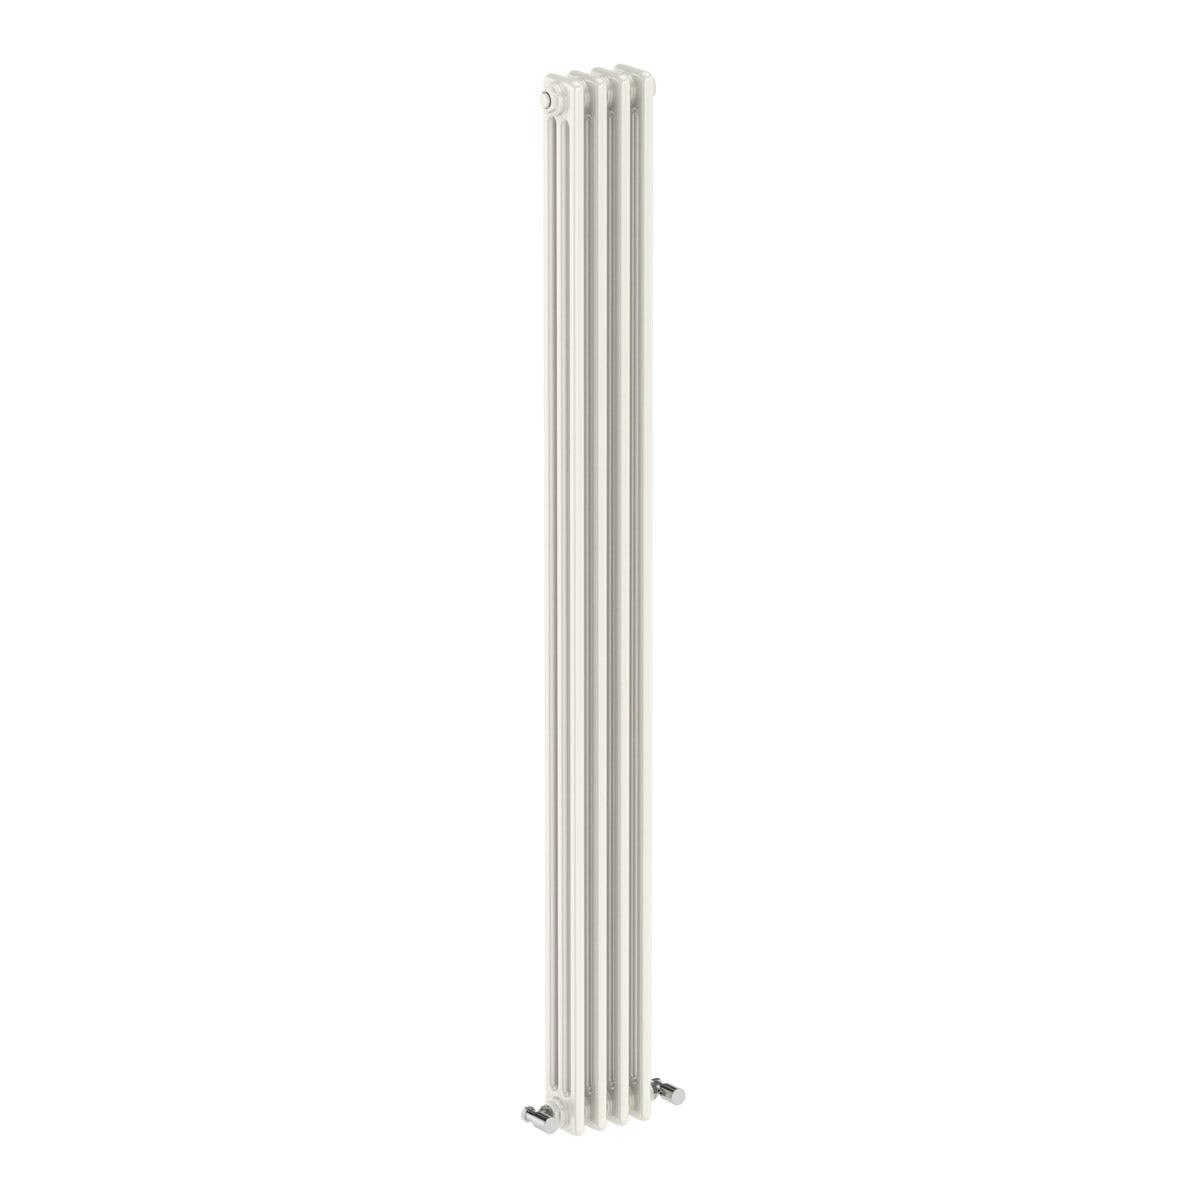 The Bath Co. Dulwich vertical white triple column radiator 1800 x 200